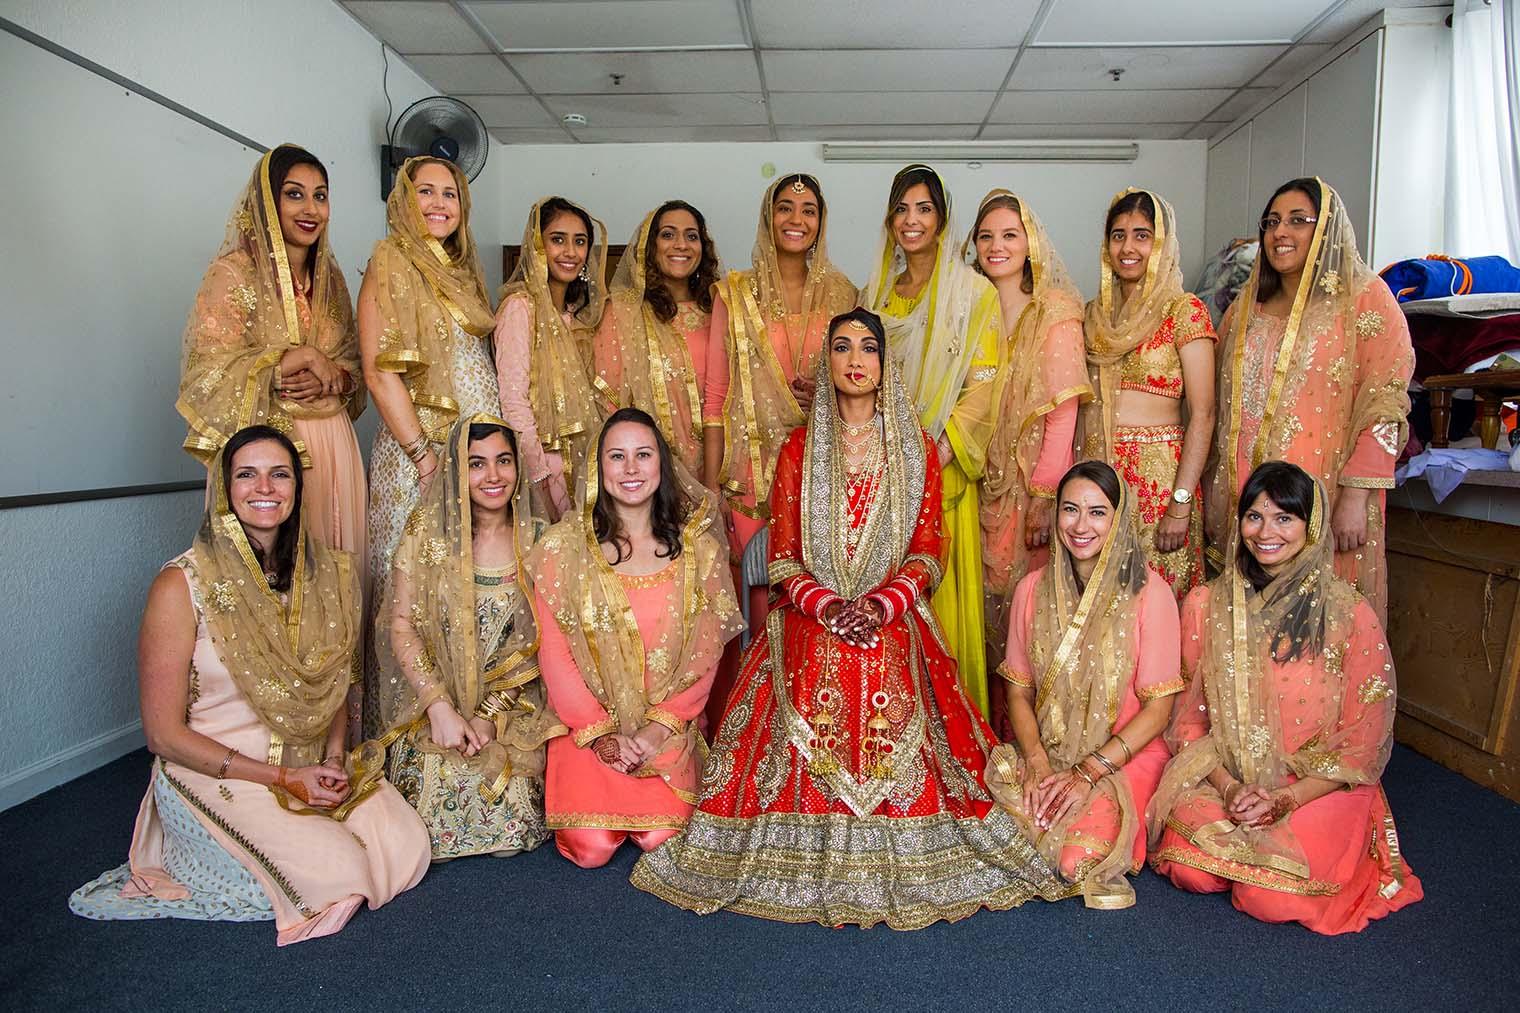 Bride and Bridesmaids at Gurdwara Sahib of Fremont